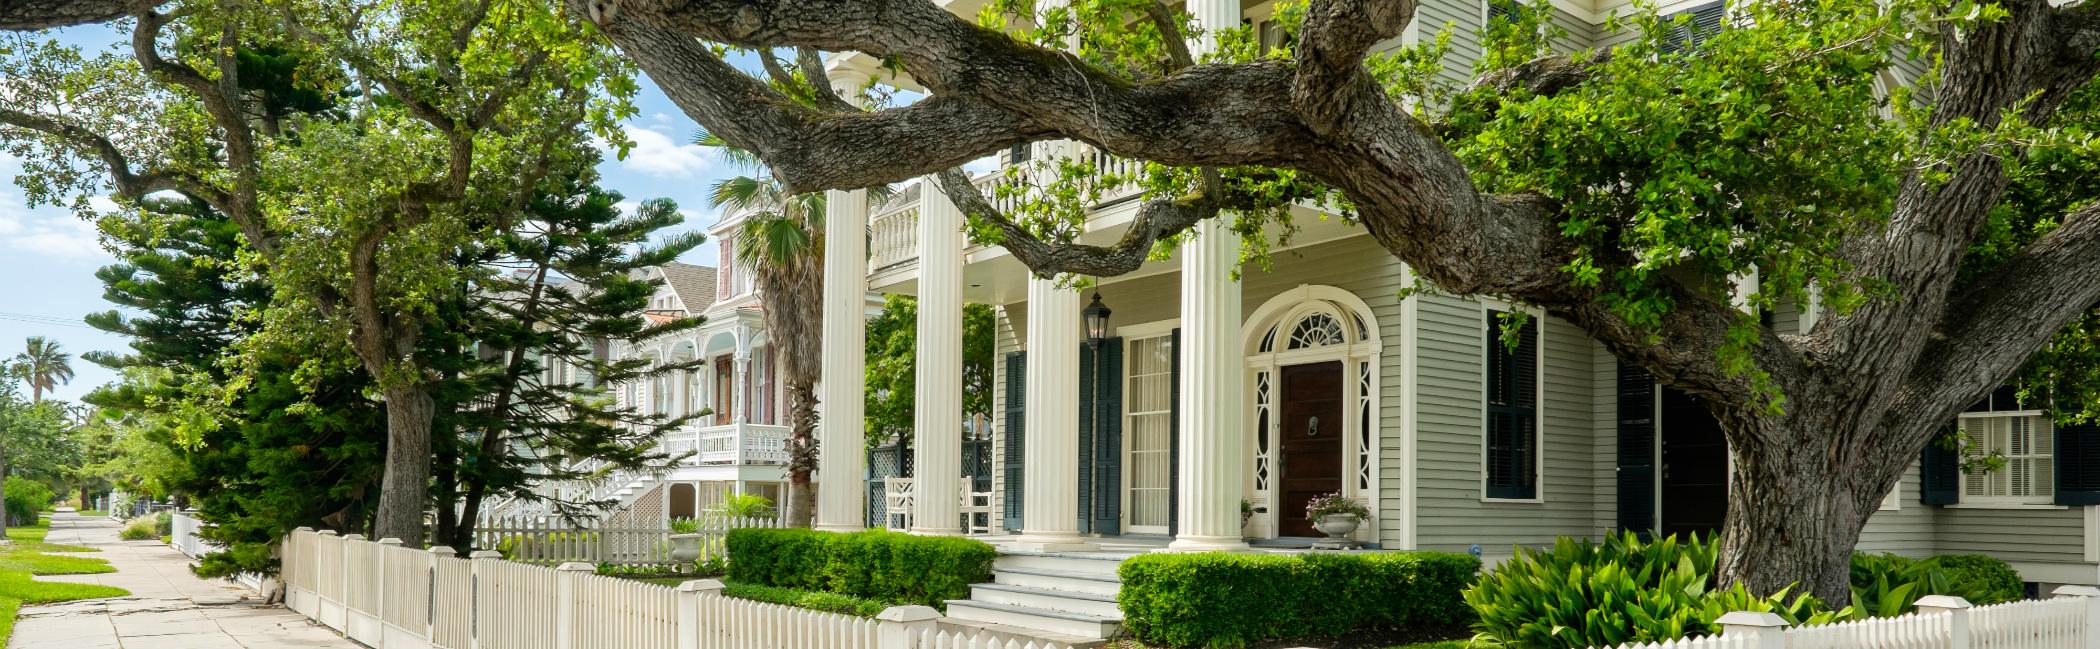 Historic Homes For Sale In San Antonio